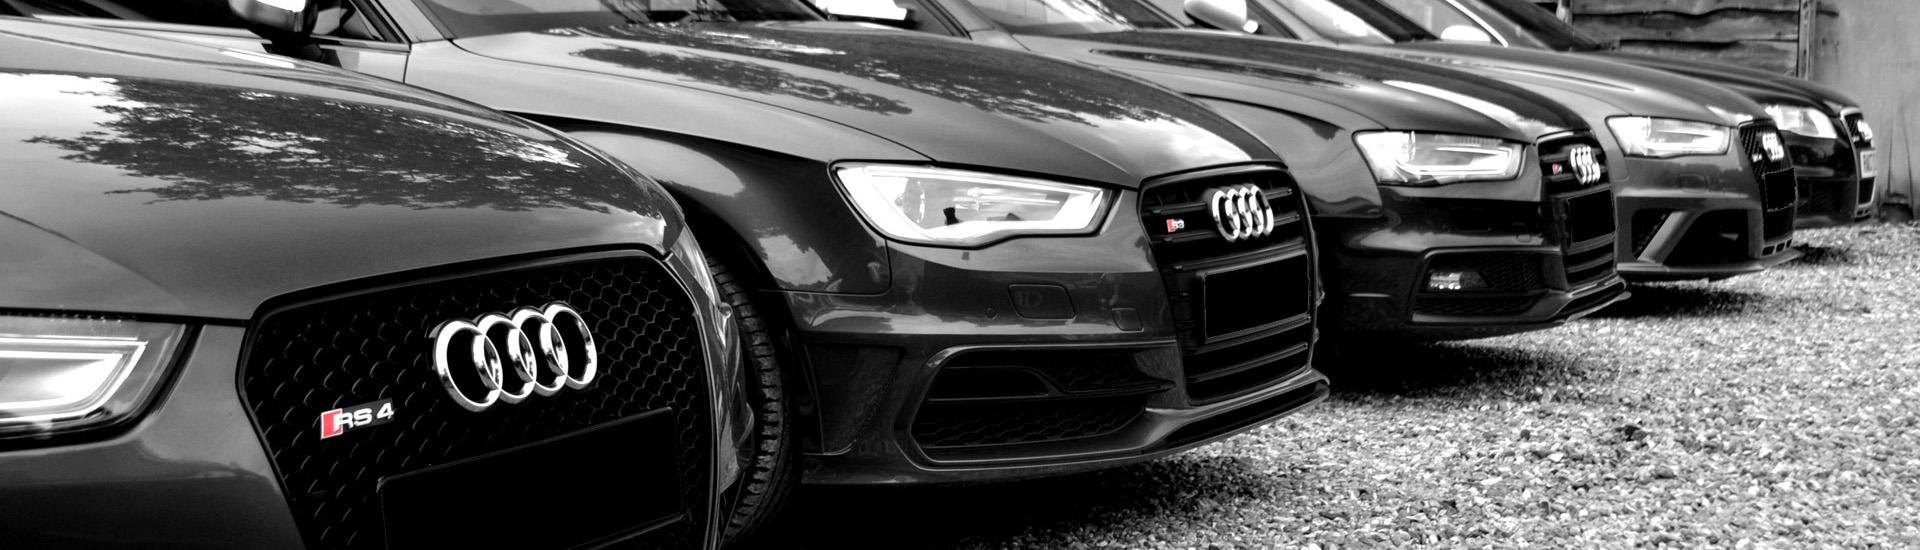 AUDI CAR BUYERS SYDNEY - SELL MY AUDI FOR CASH